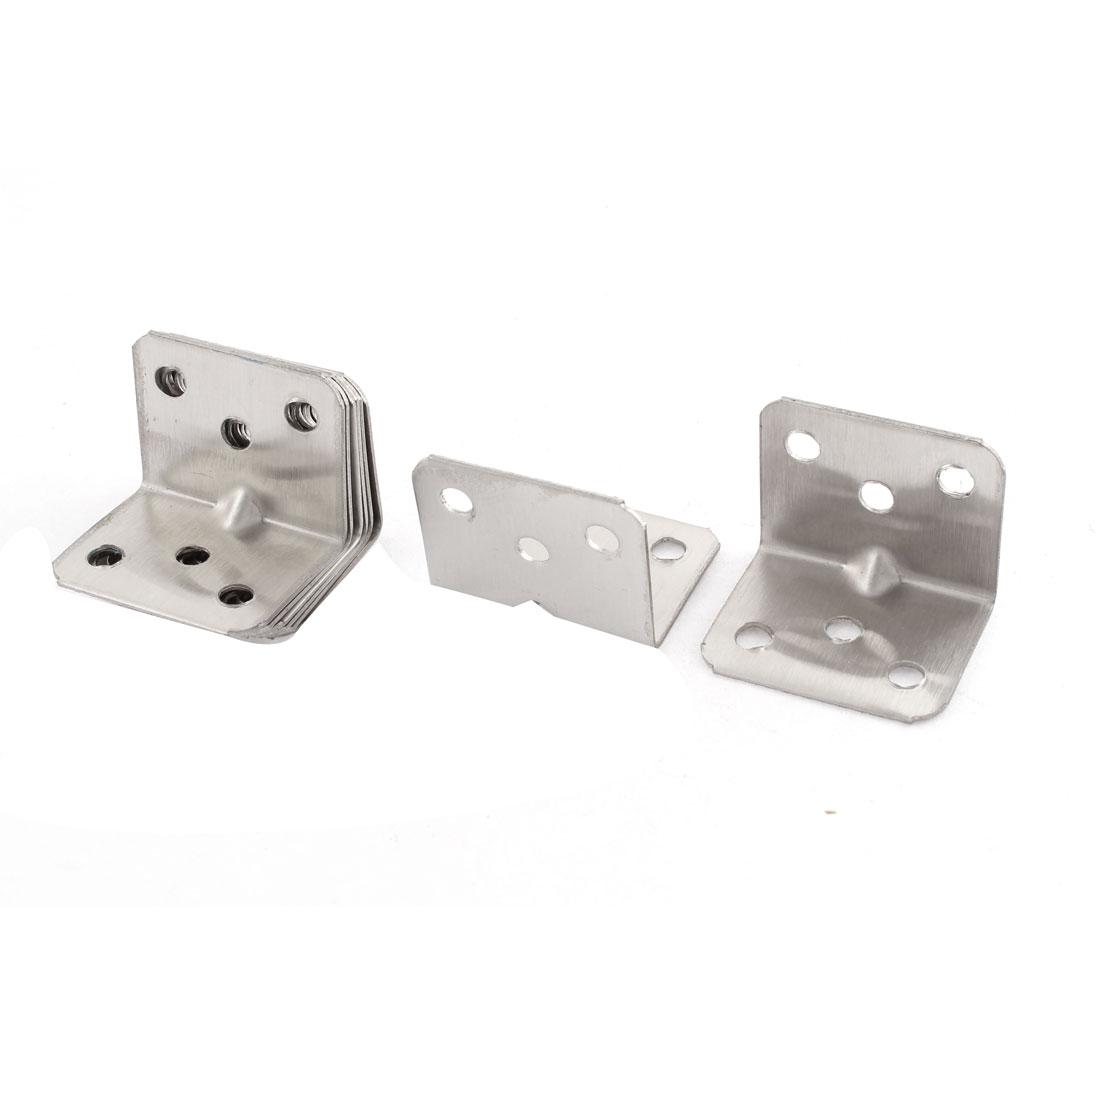 8 Pcs Furniture Cupboard Fittings Silver Tone Angle Repair Bracket Corner Braces